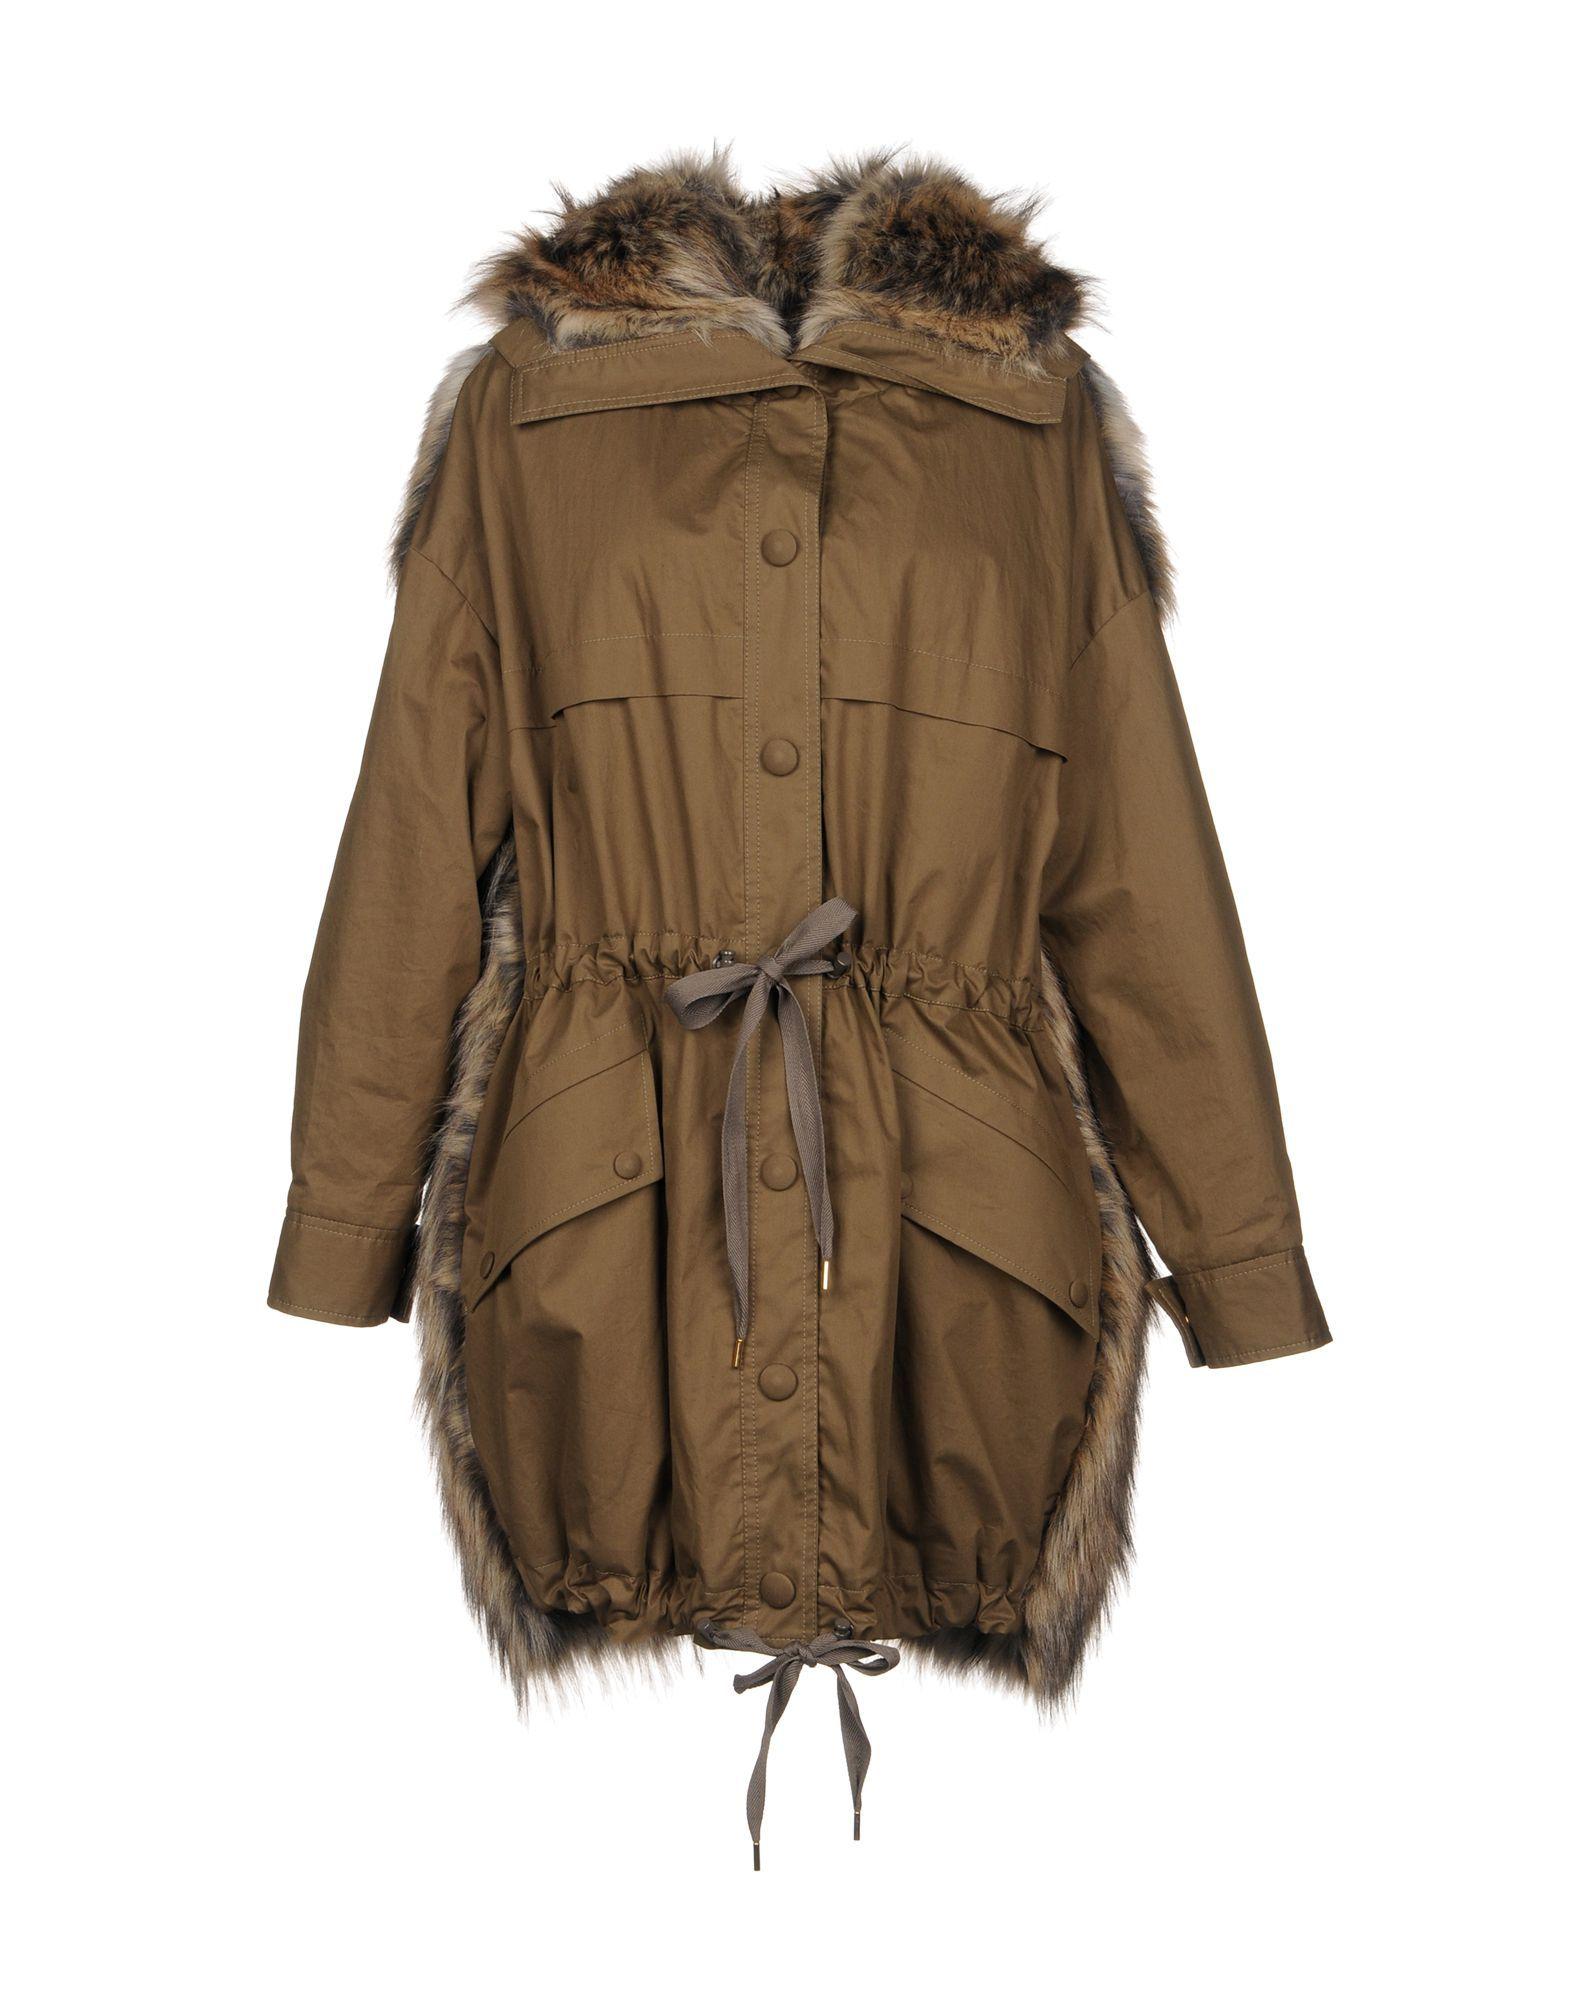 Stella McCartney Military Green Cotton Parka Jacket